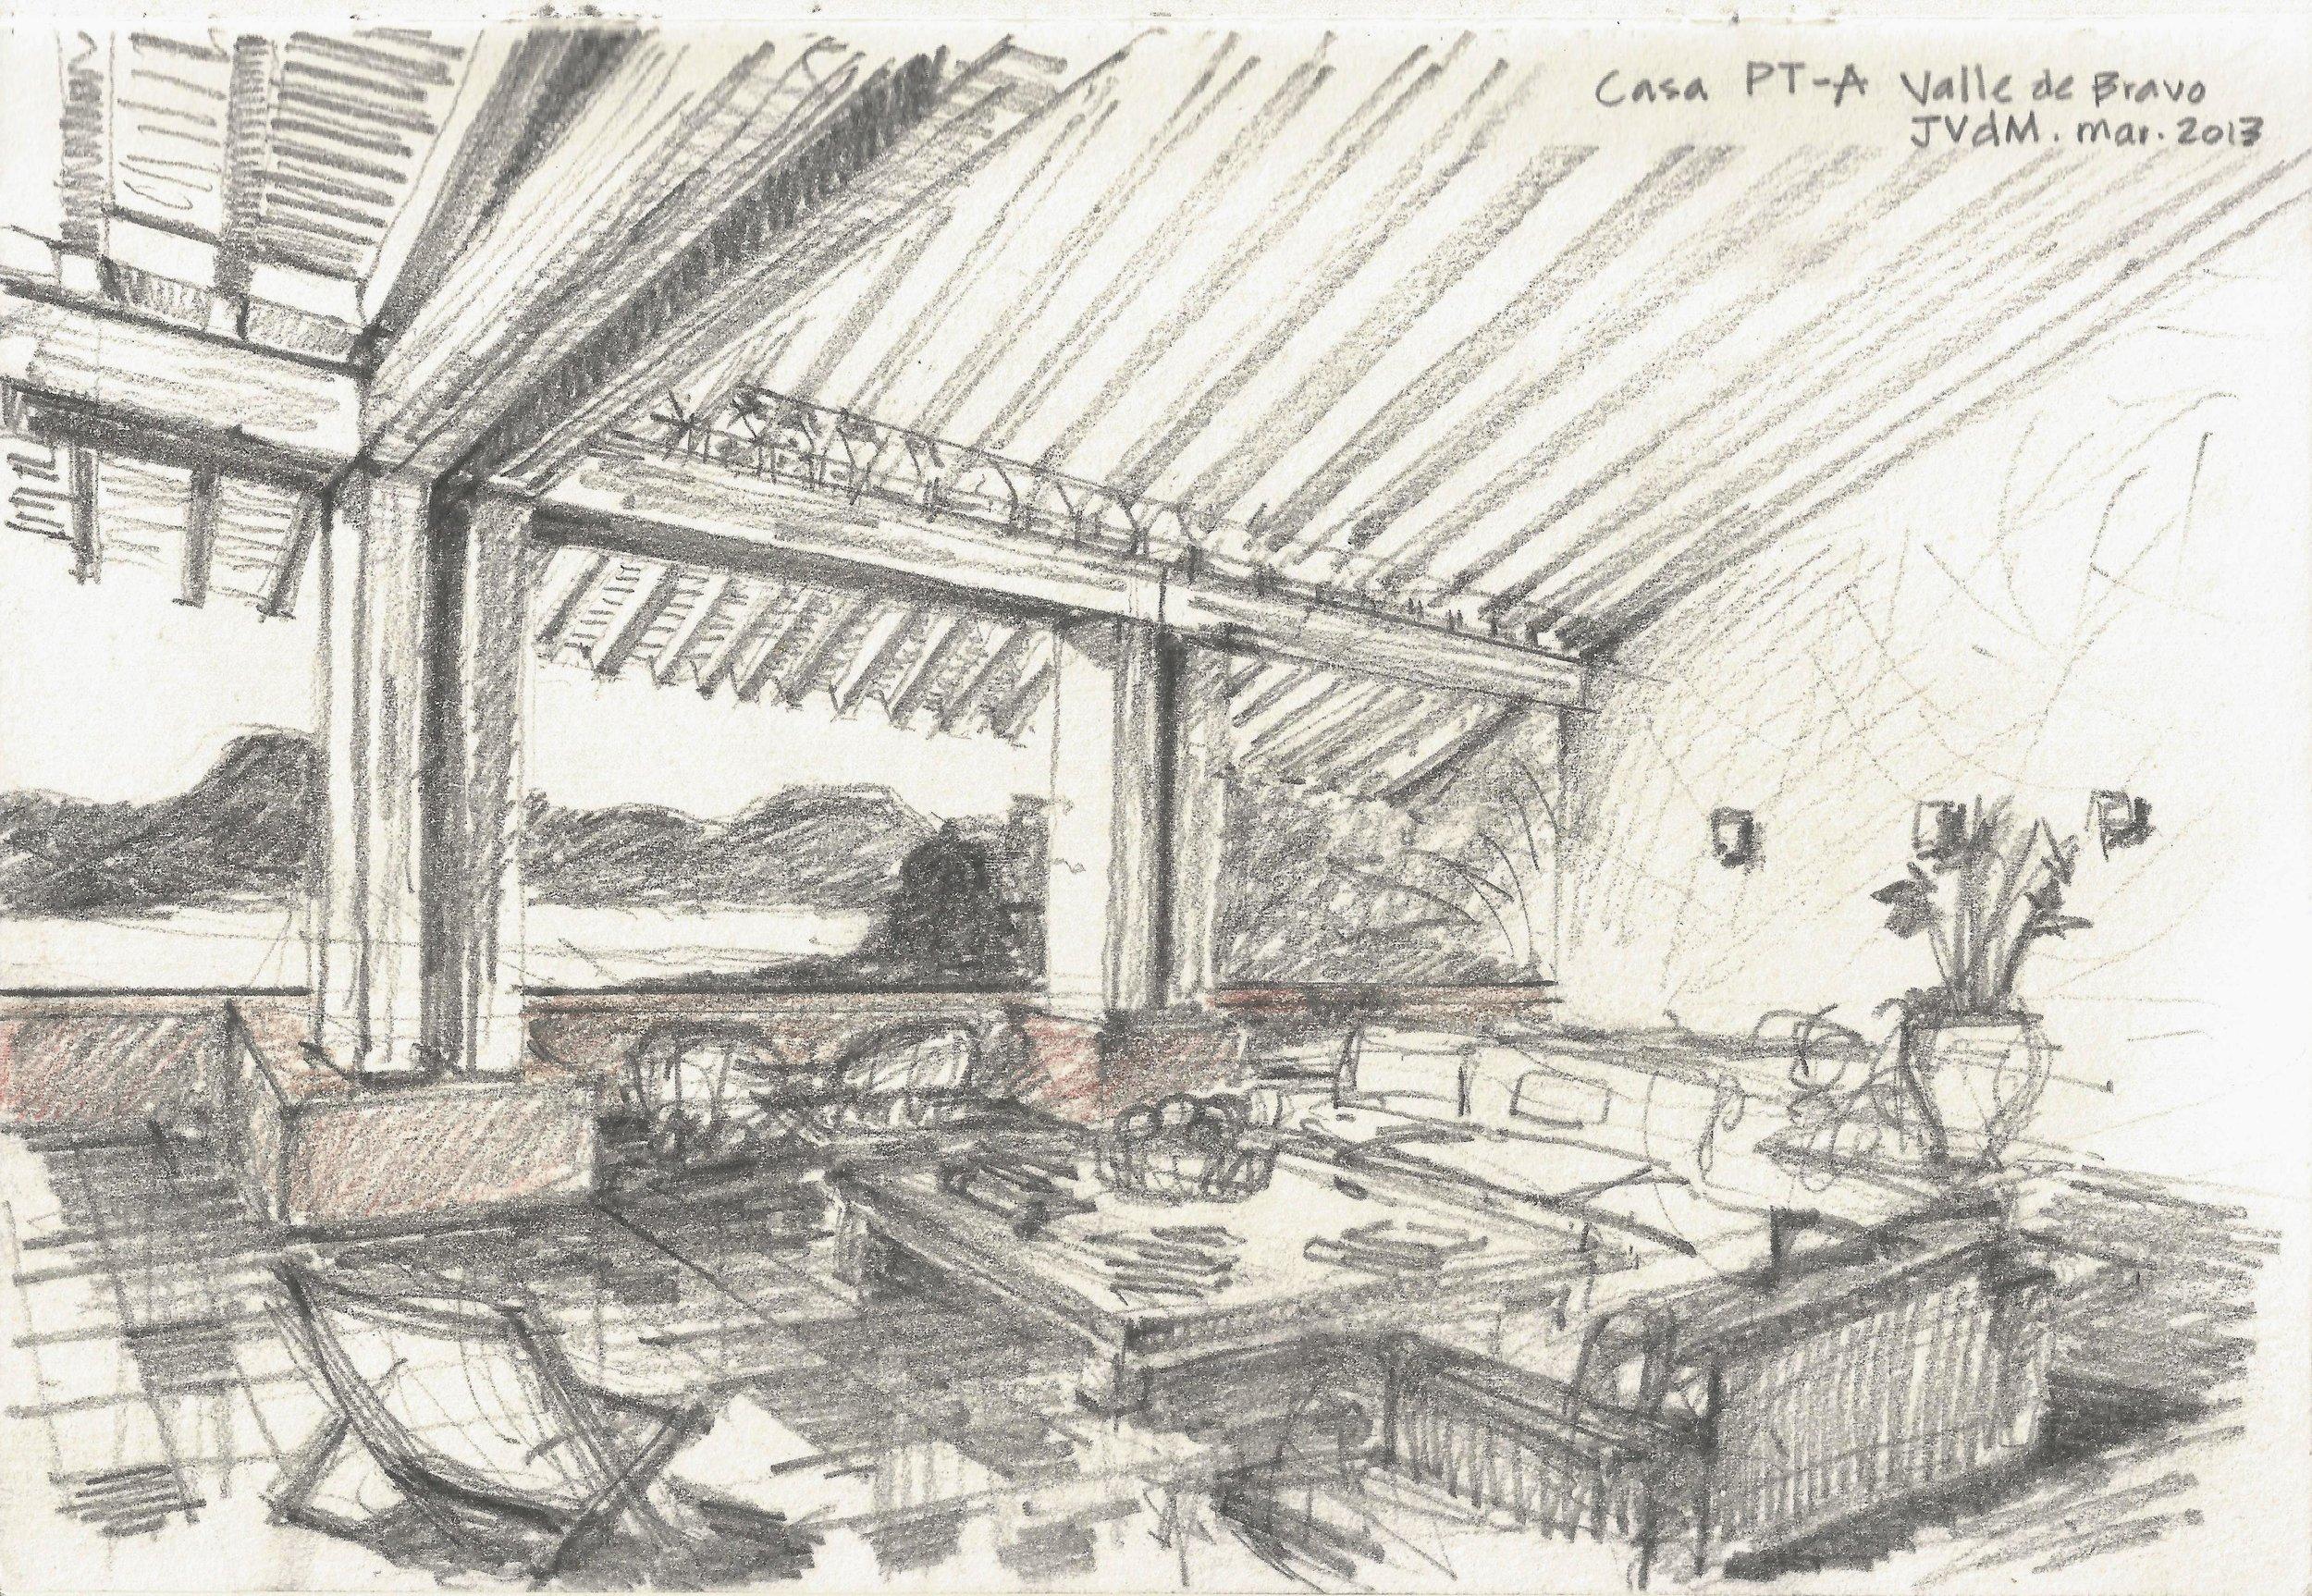 casa PT-A Valle de bravo 2013 (3).jpg